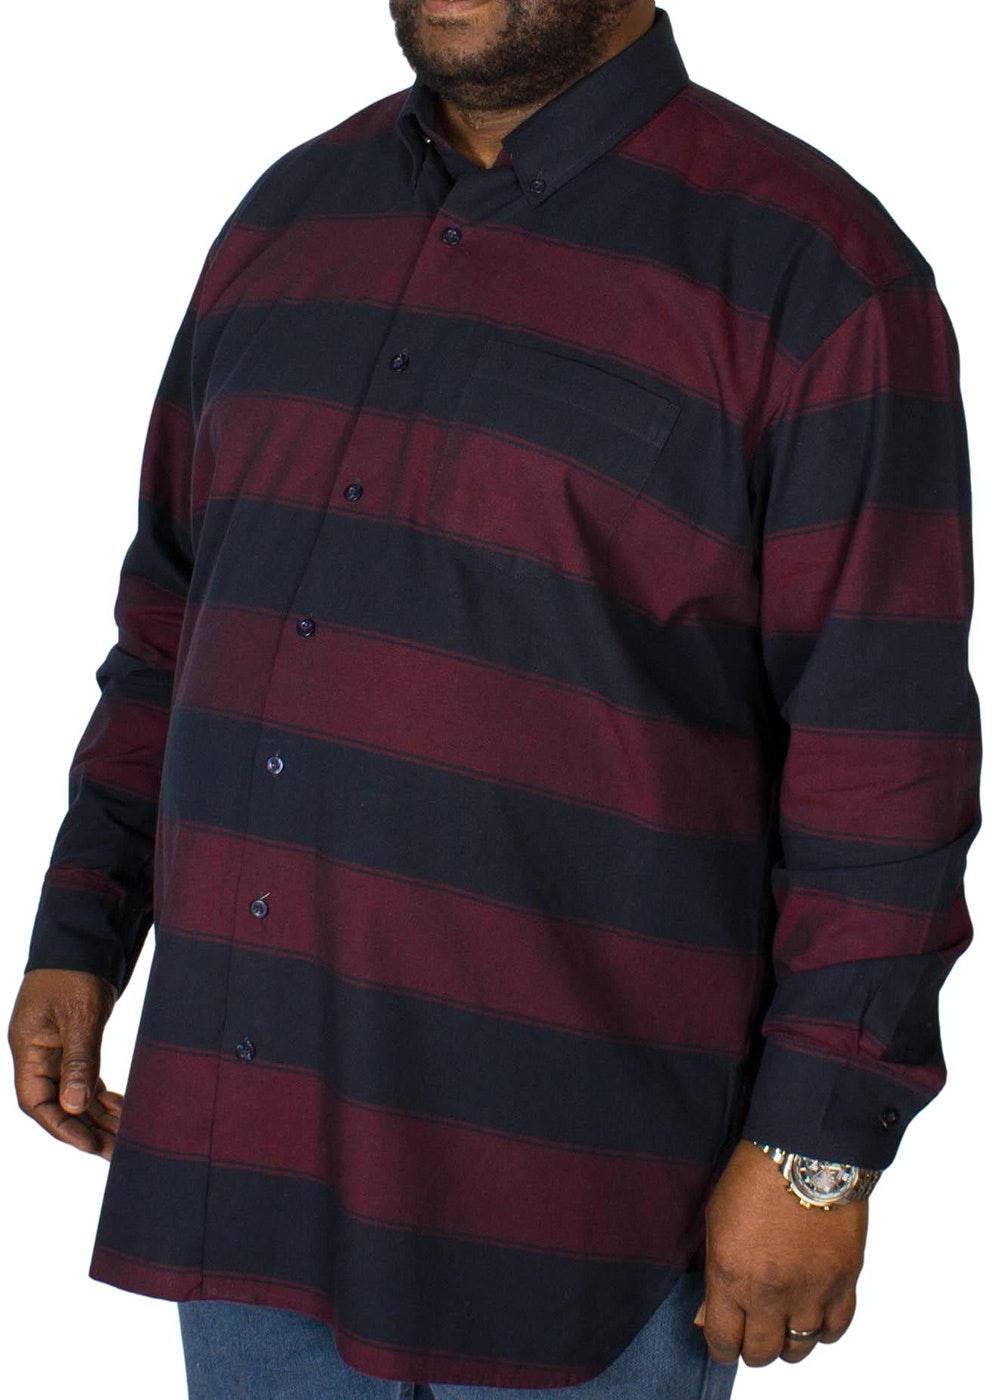 Espionage Blanket Stripe Long Sleeve Shirt Navy/Wine